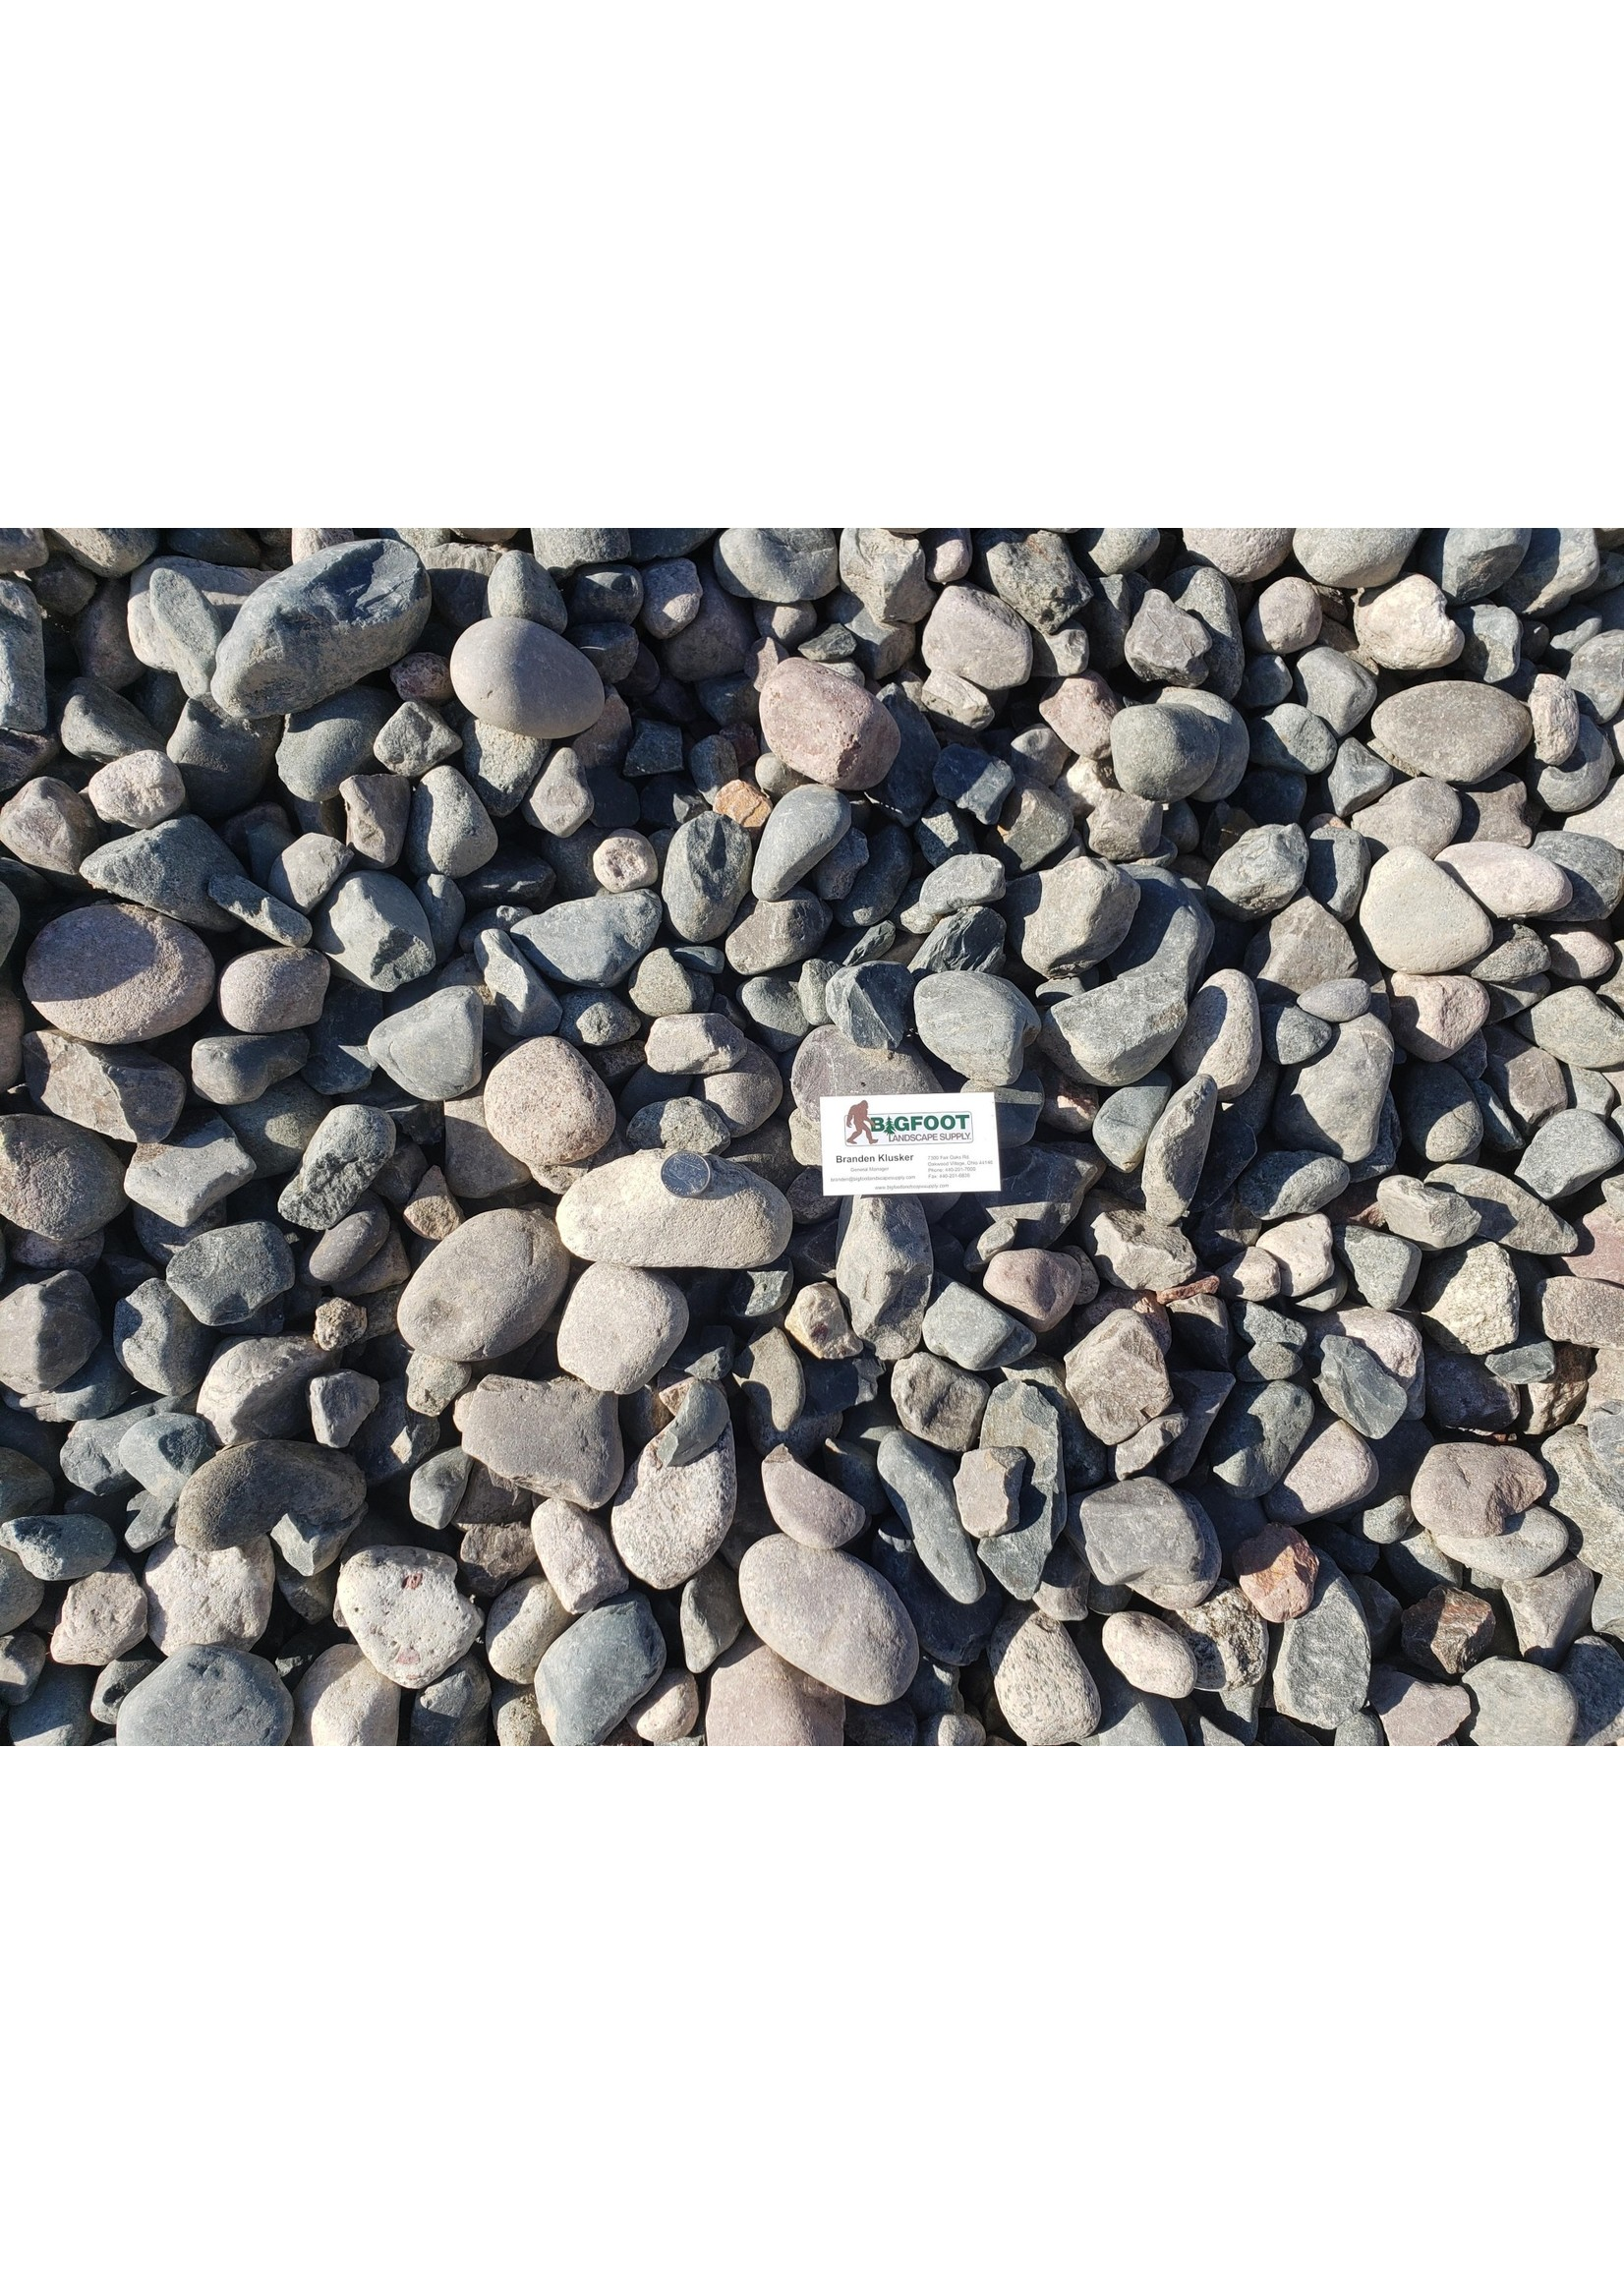 Bulk #4 Bluestone 1 YD (Decorative Canadian Stone)